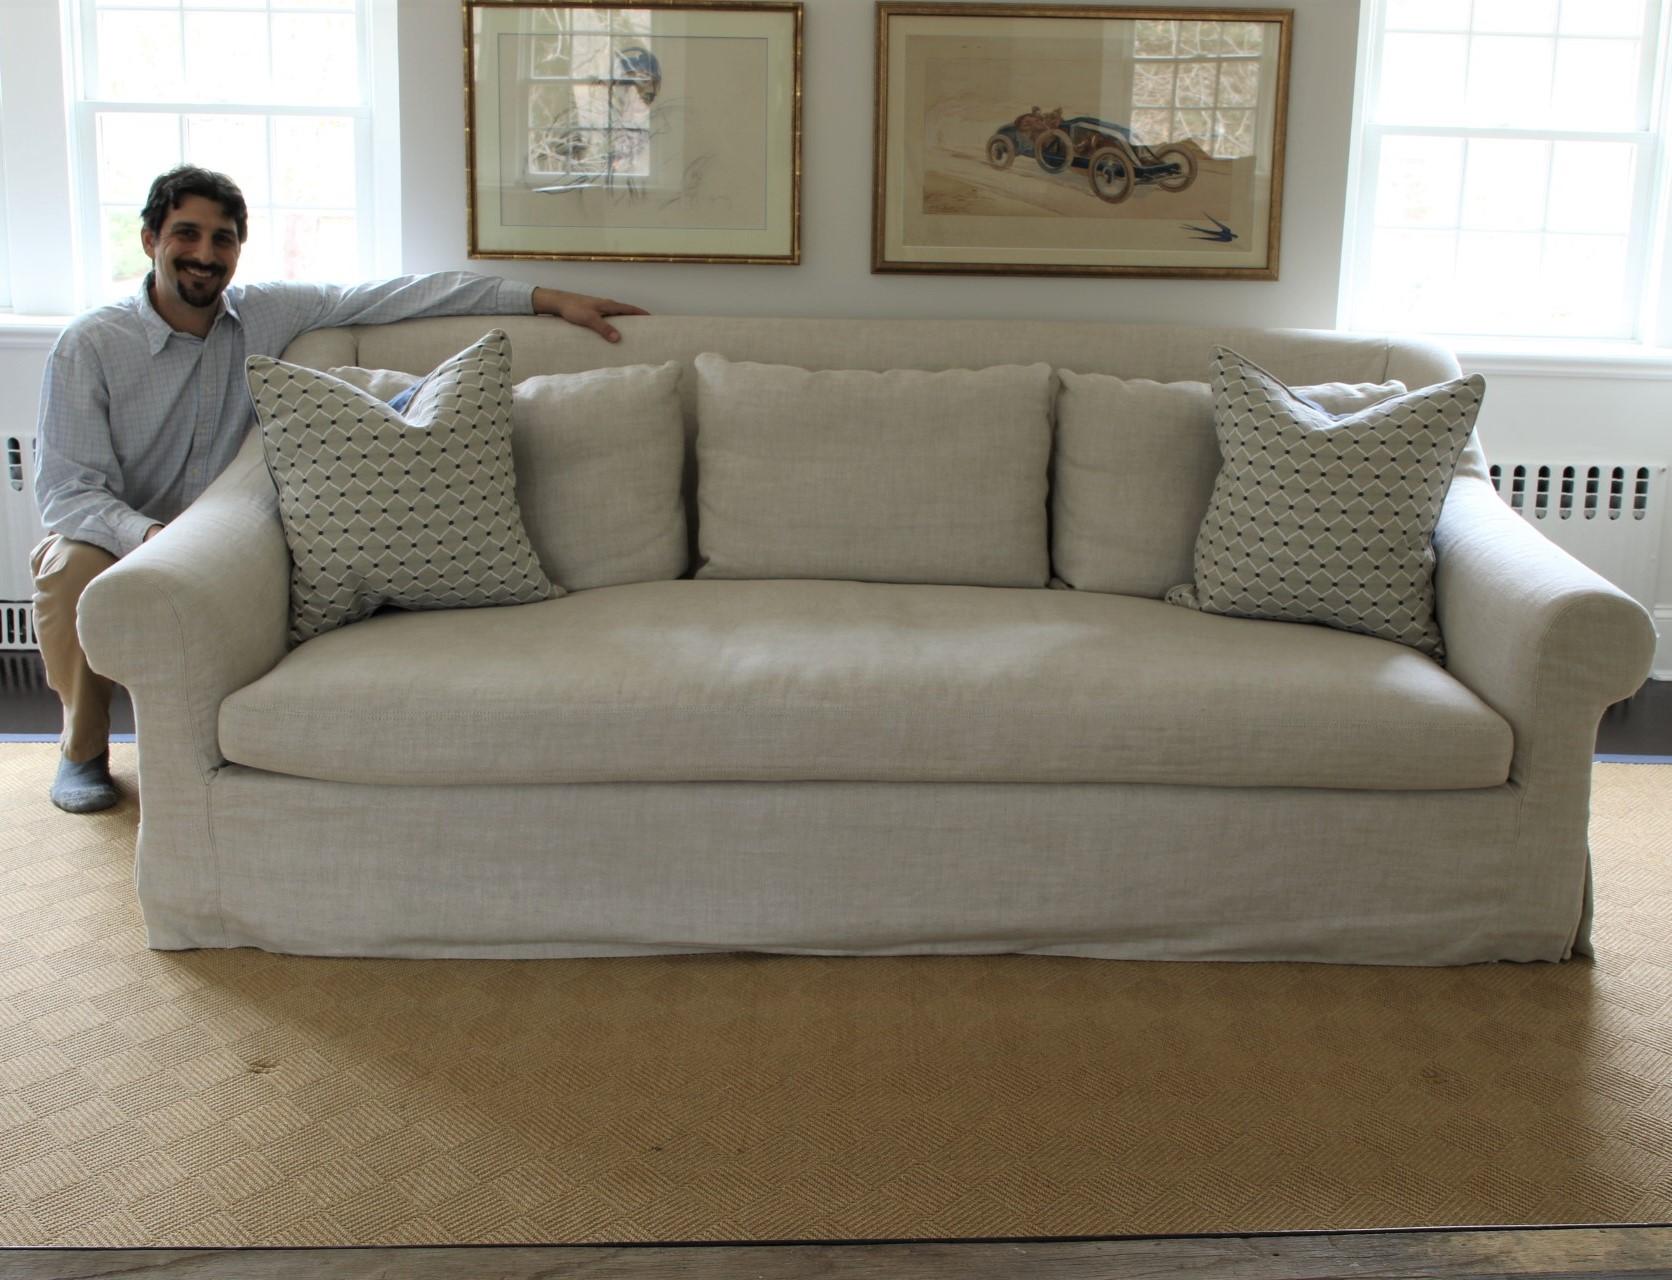 restoration hardware sectional sofa linen bett beautiful with ryan studio